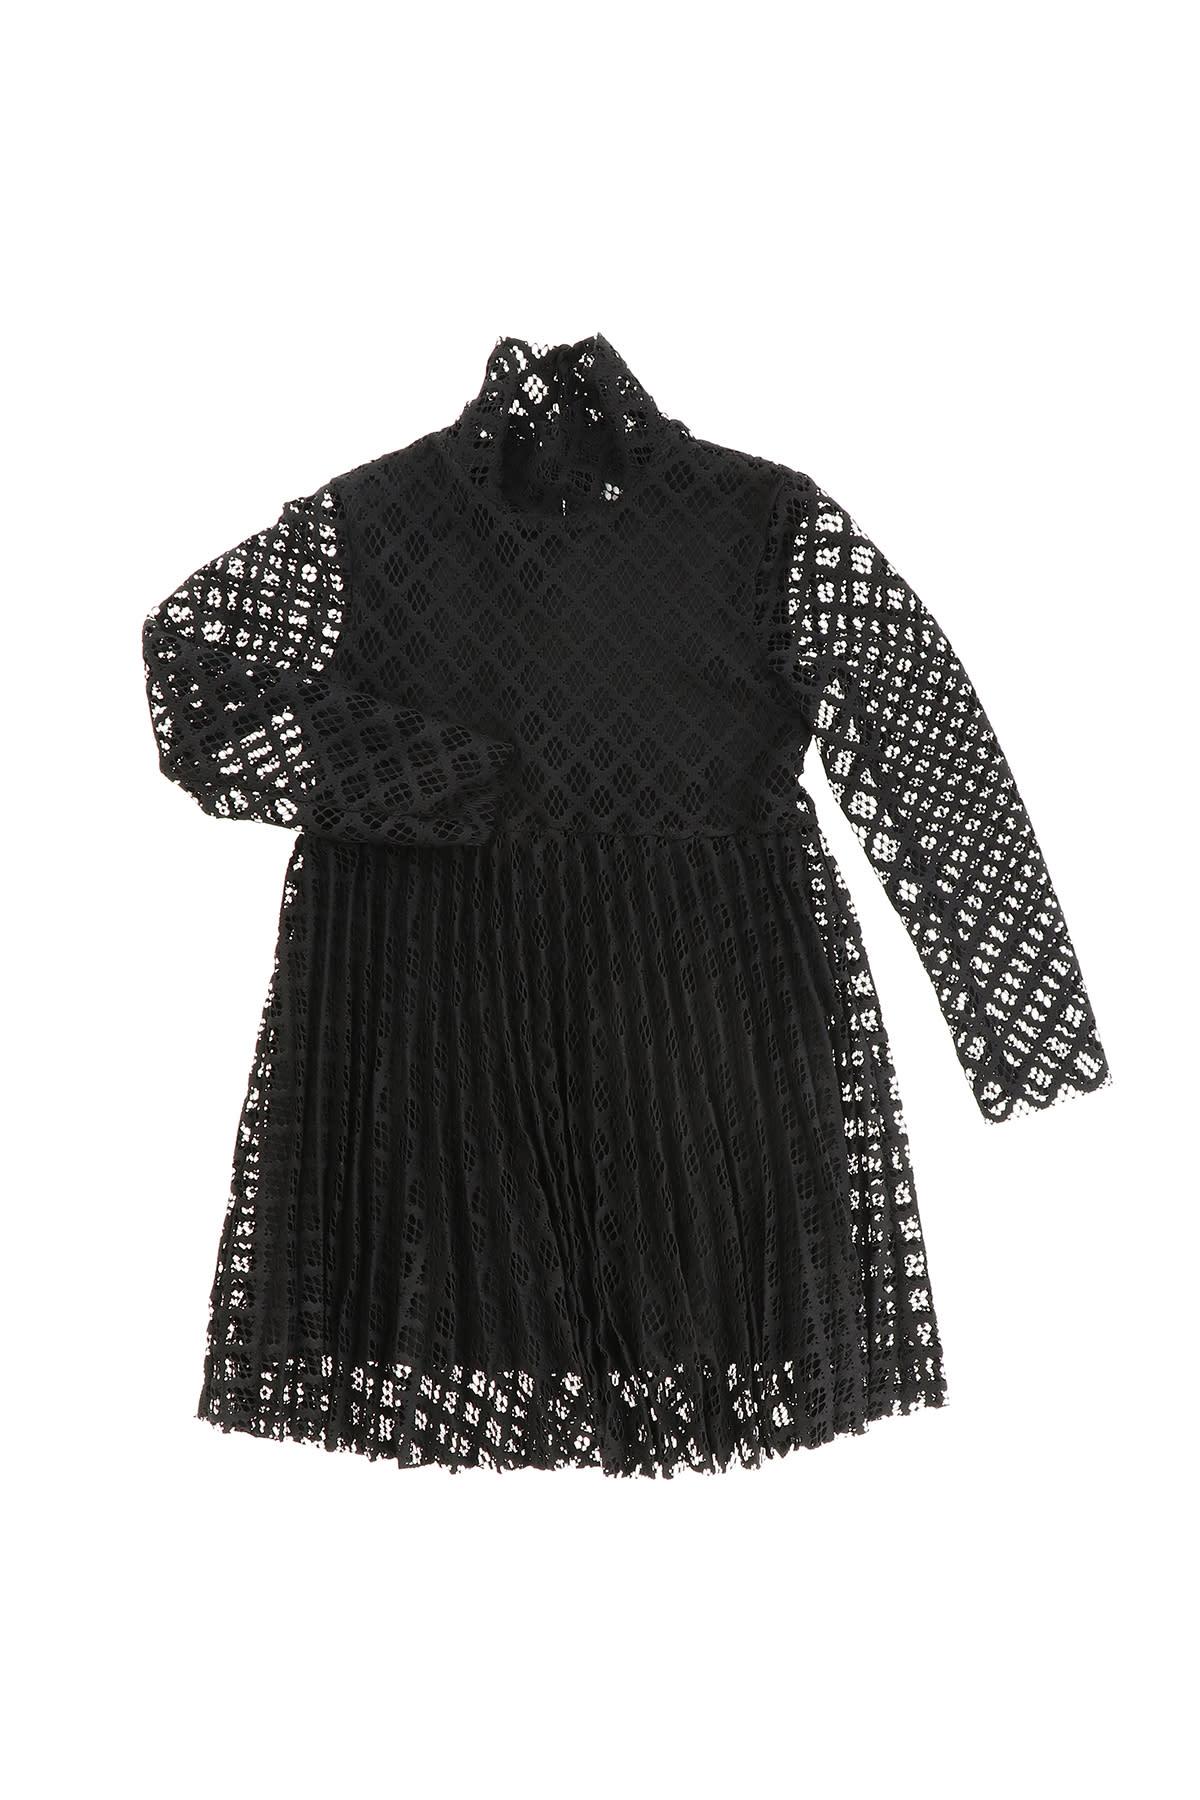 Buy Philosophy di Lorenzo Serafini Kids Perforated Fabric Dress online, shop Philosophy di Lorenzo Serafini Kids with free shipping